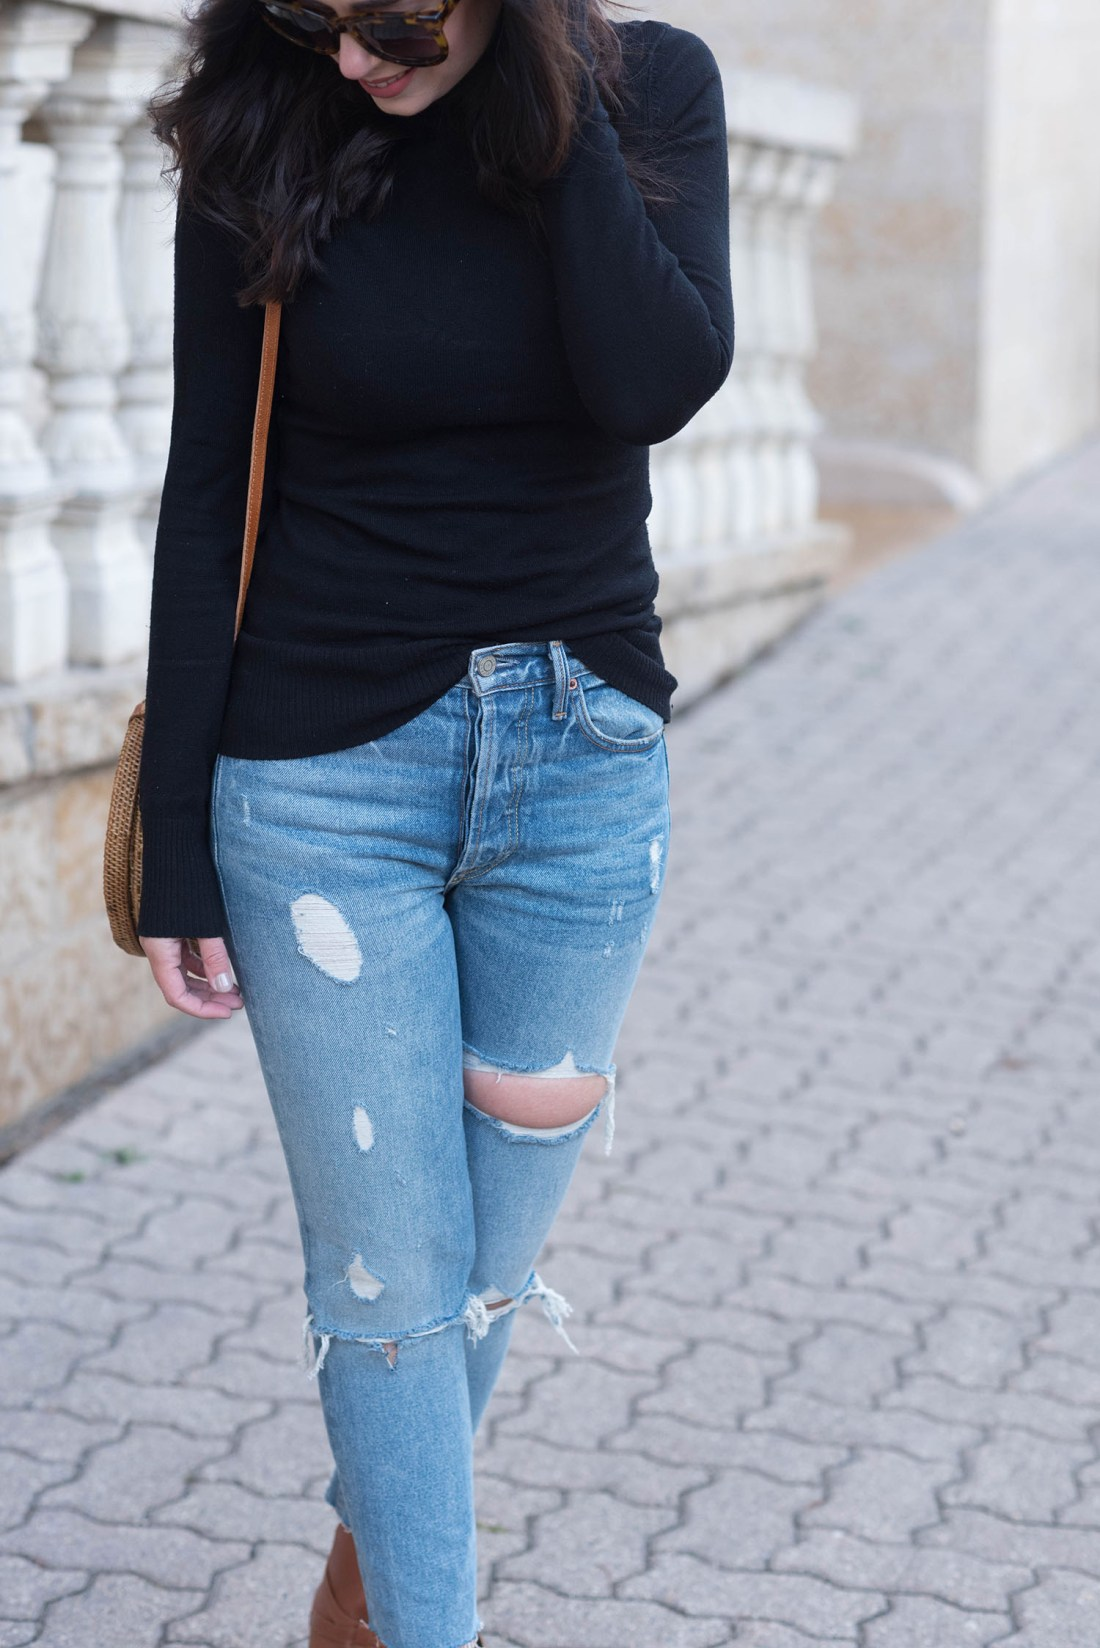 Outfit details on Winnipeg fashion blogger Cee Fardoe of Coco & Vera, including Grlfrnd Karolina jeans and Anine Bing tortoise shell sunglasses